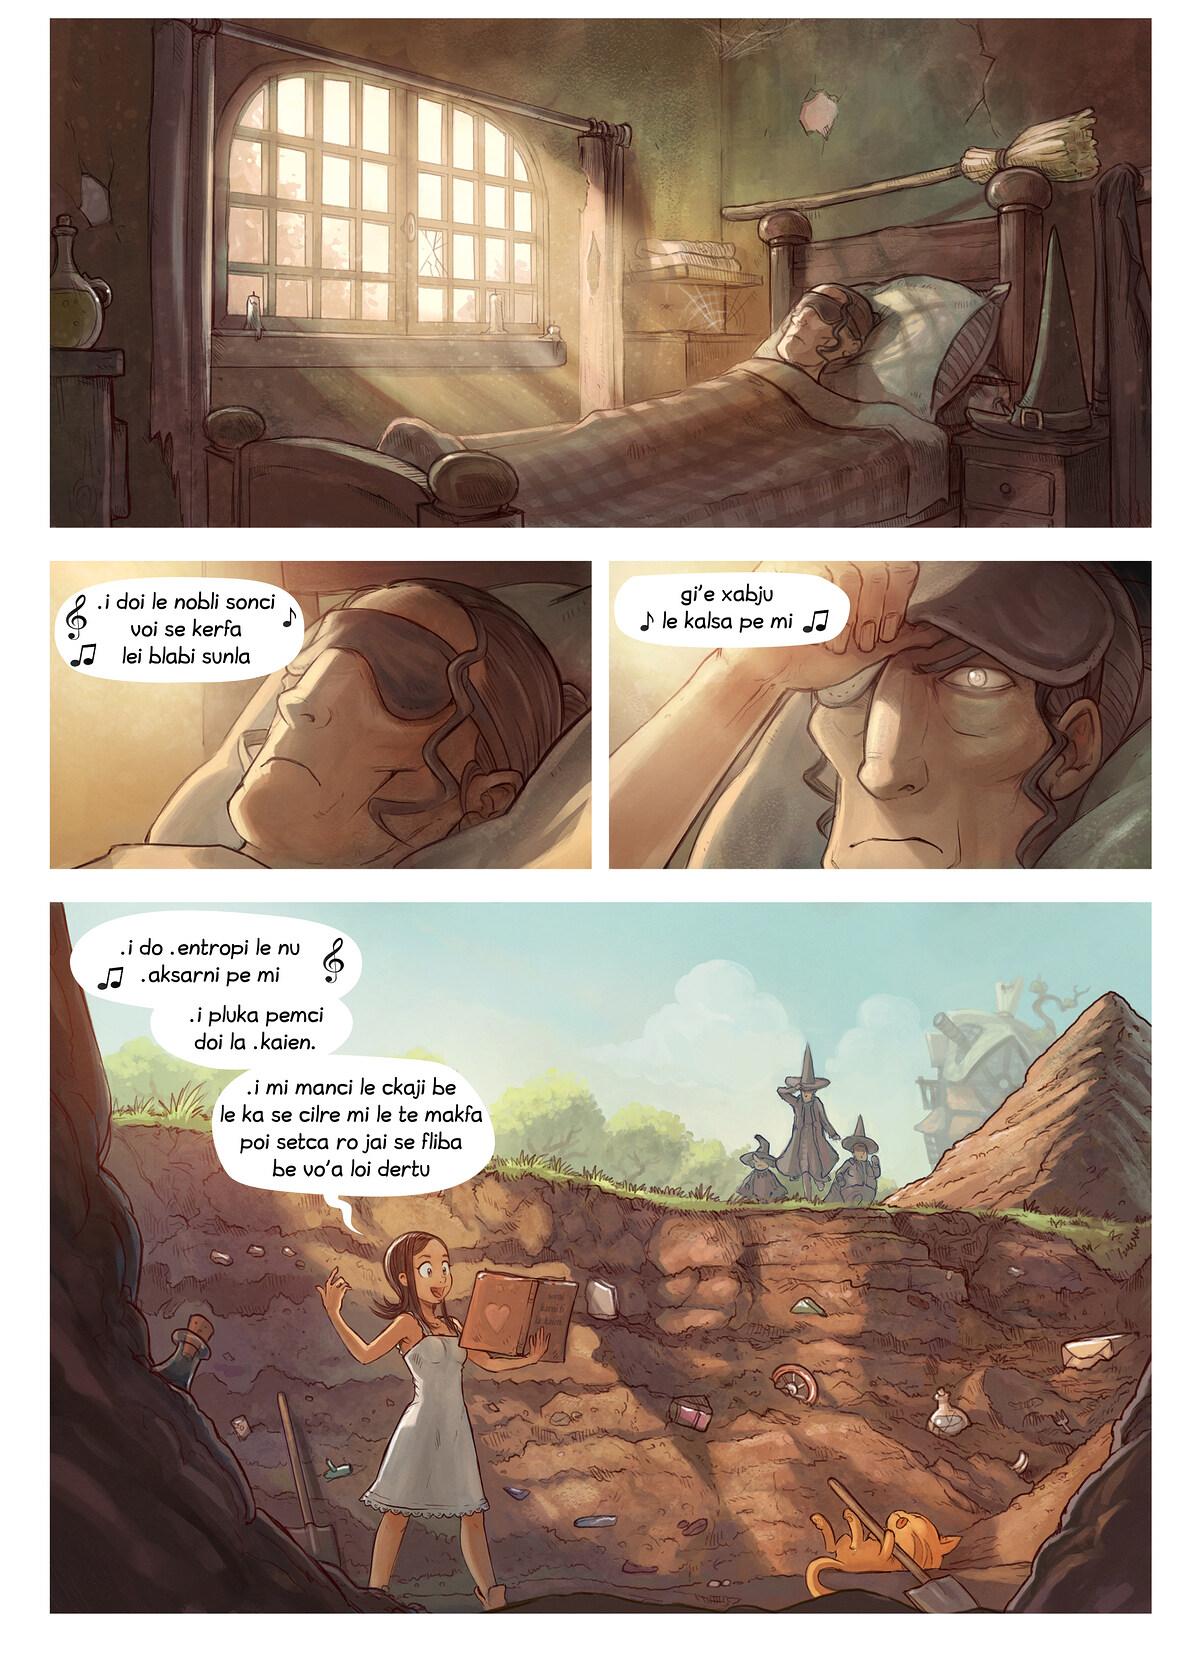 A webcomic page of Pepper&Carrot, pagbu 19 [jb], papri 4